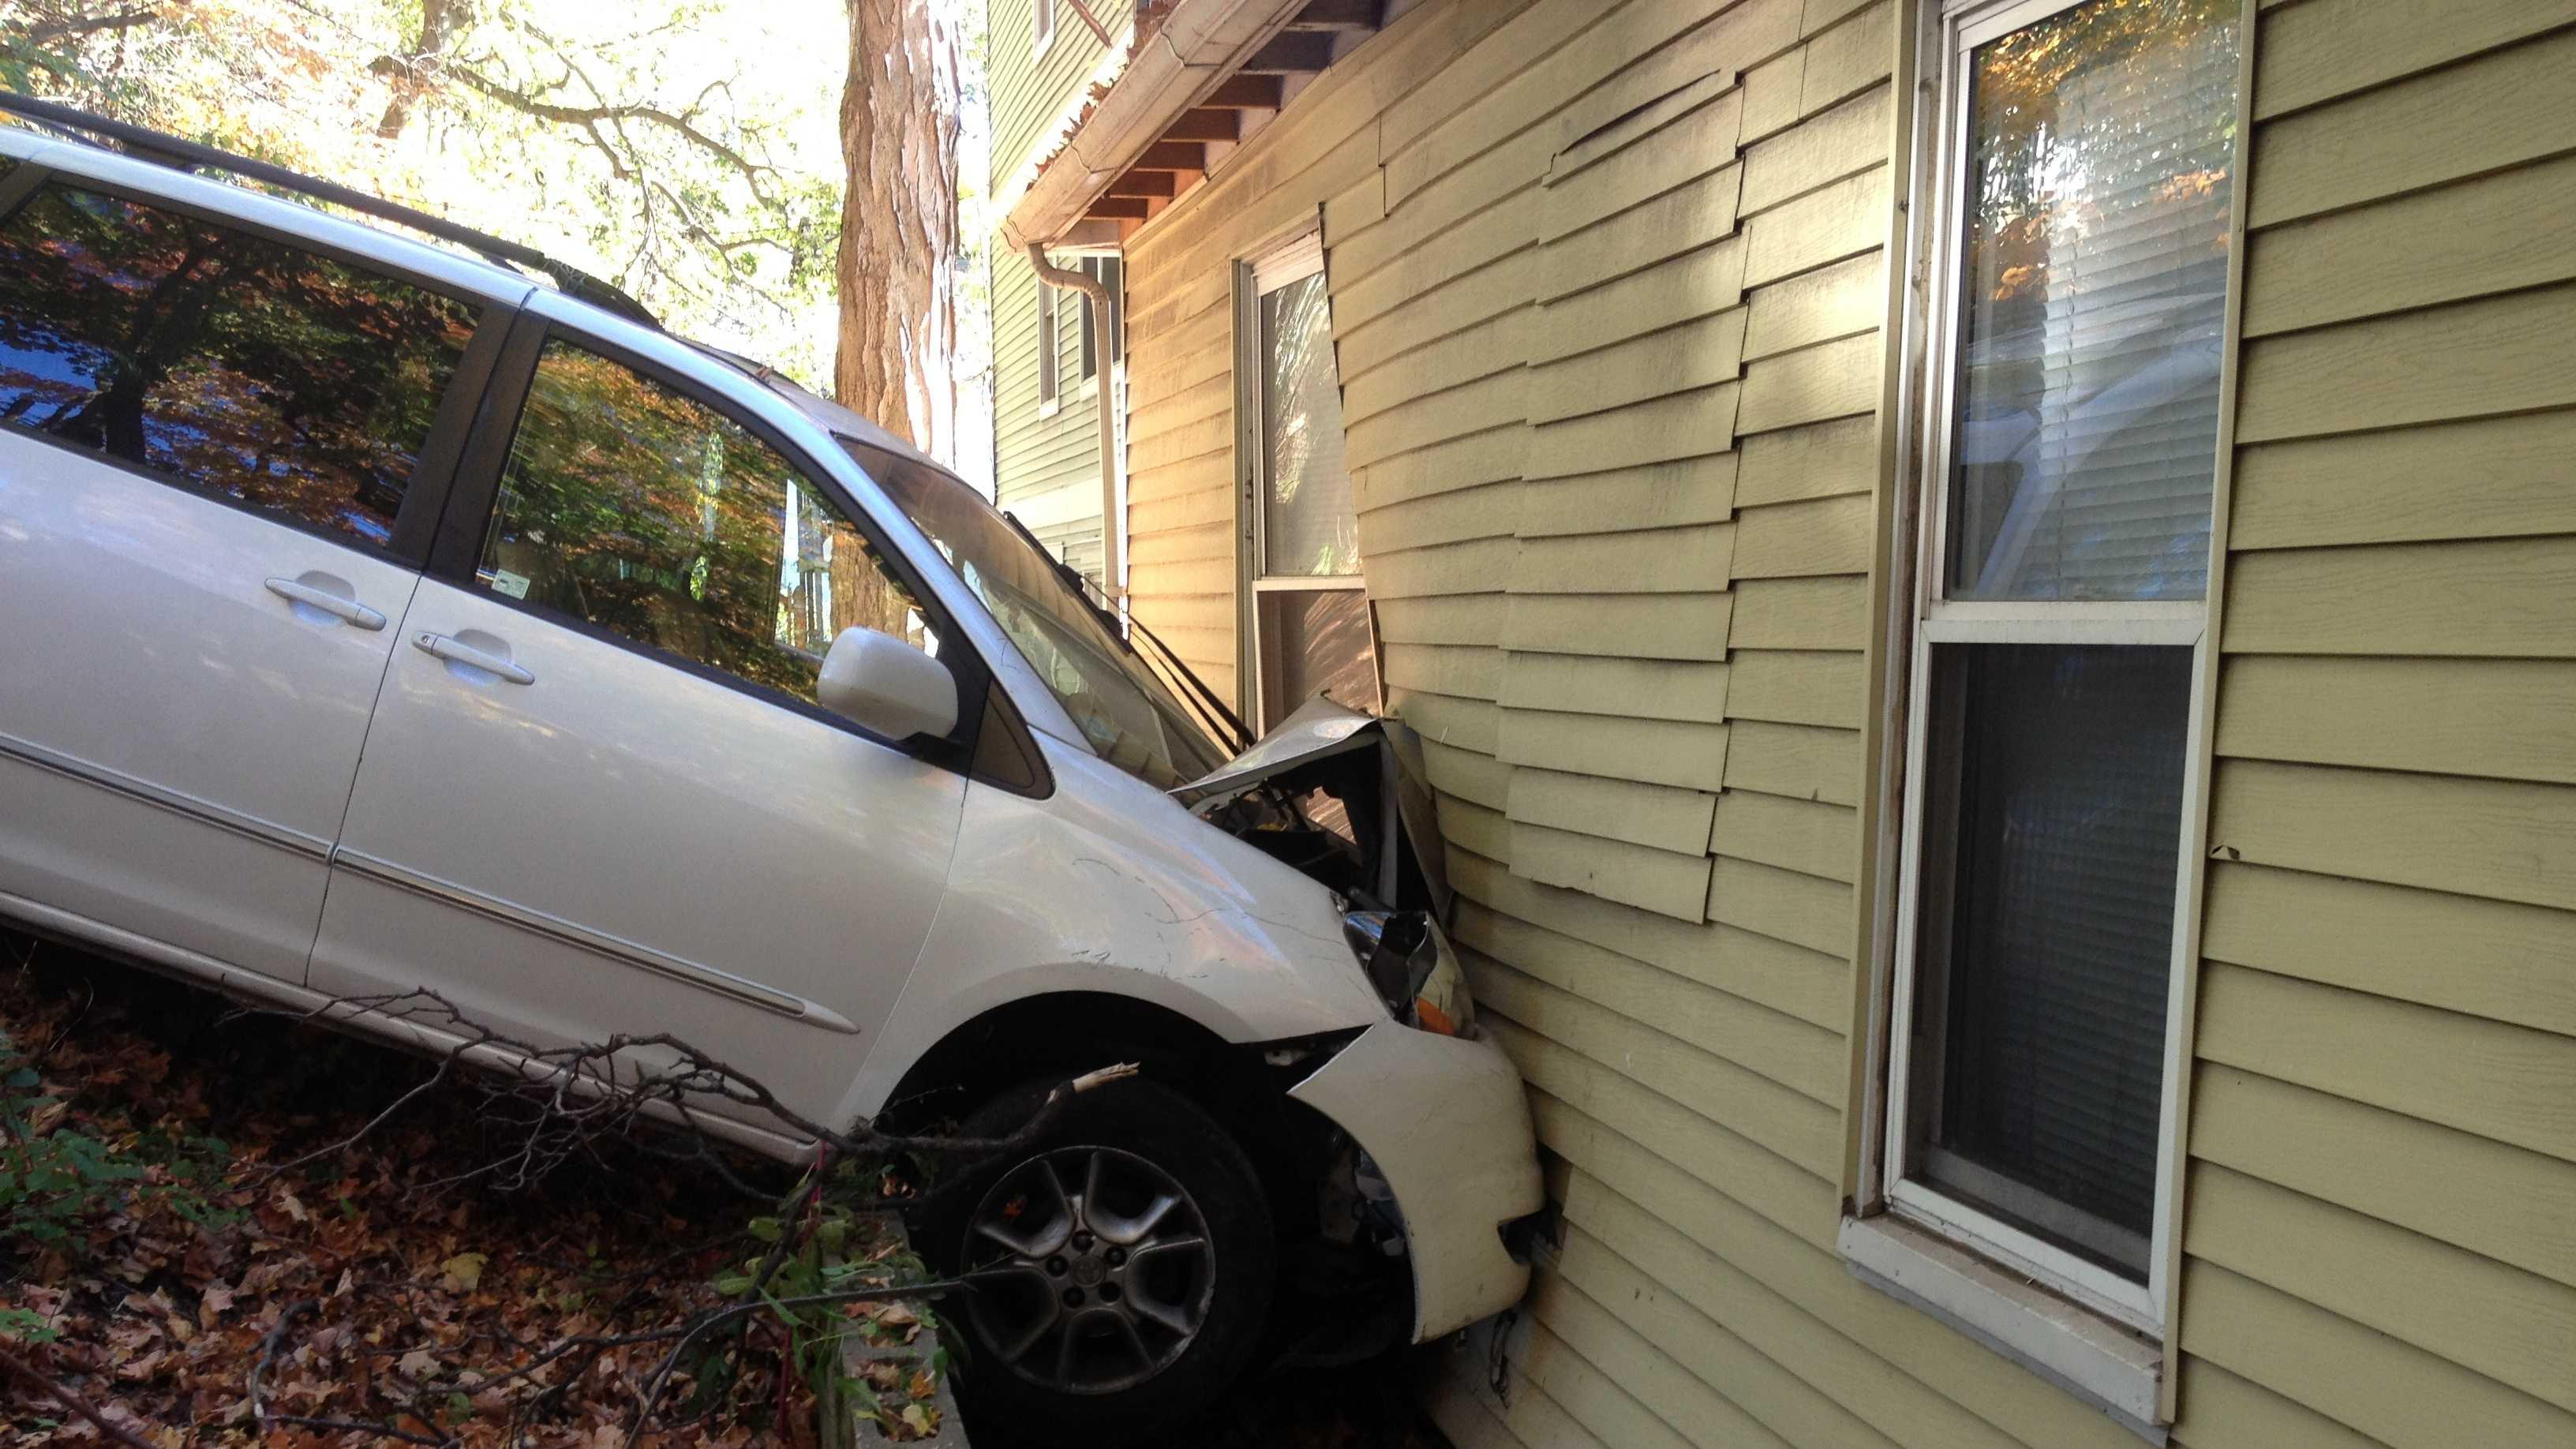 One injured when minivan hits Dorchester home